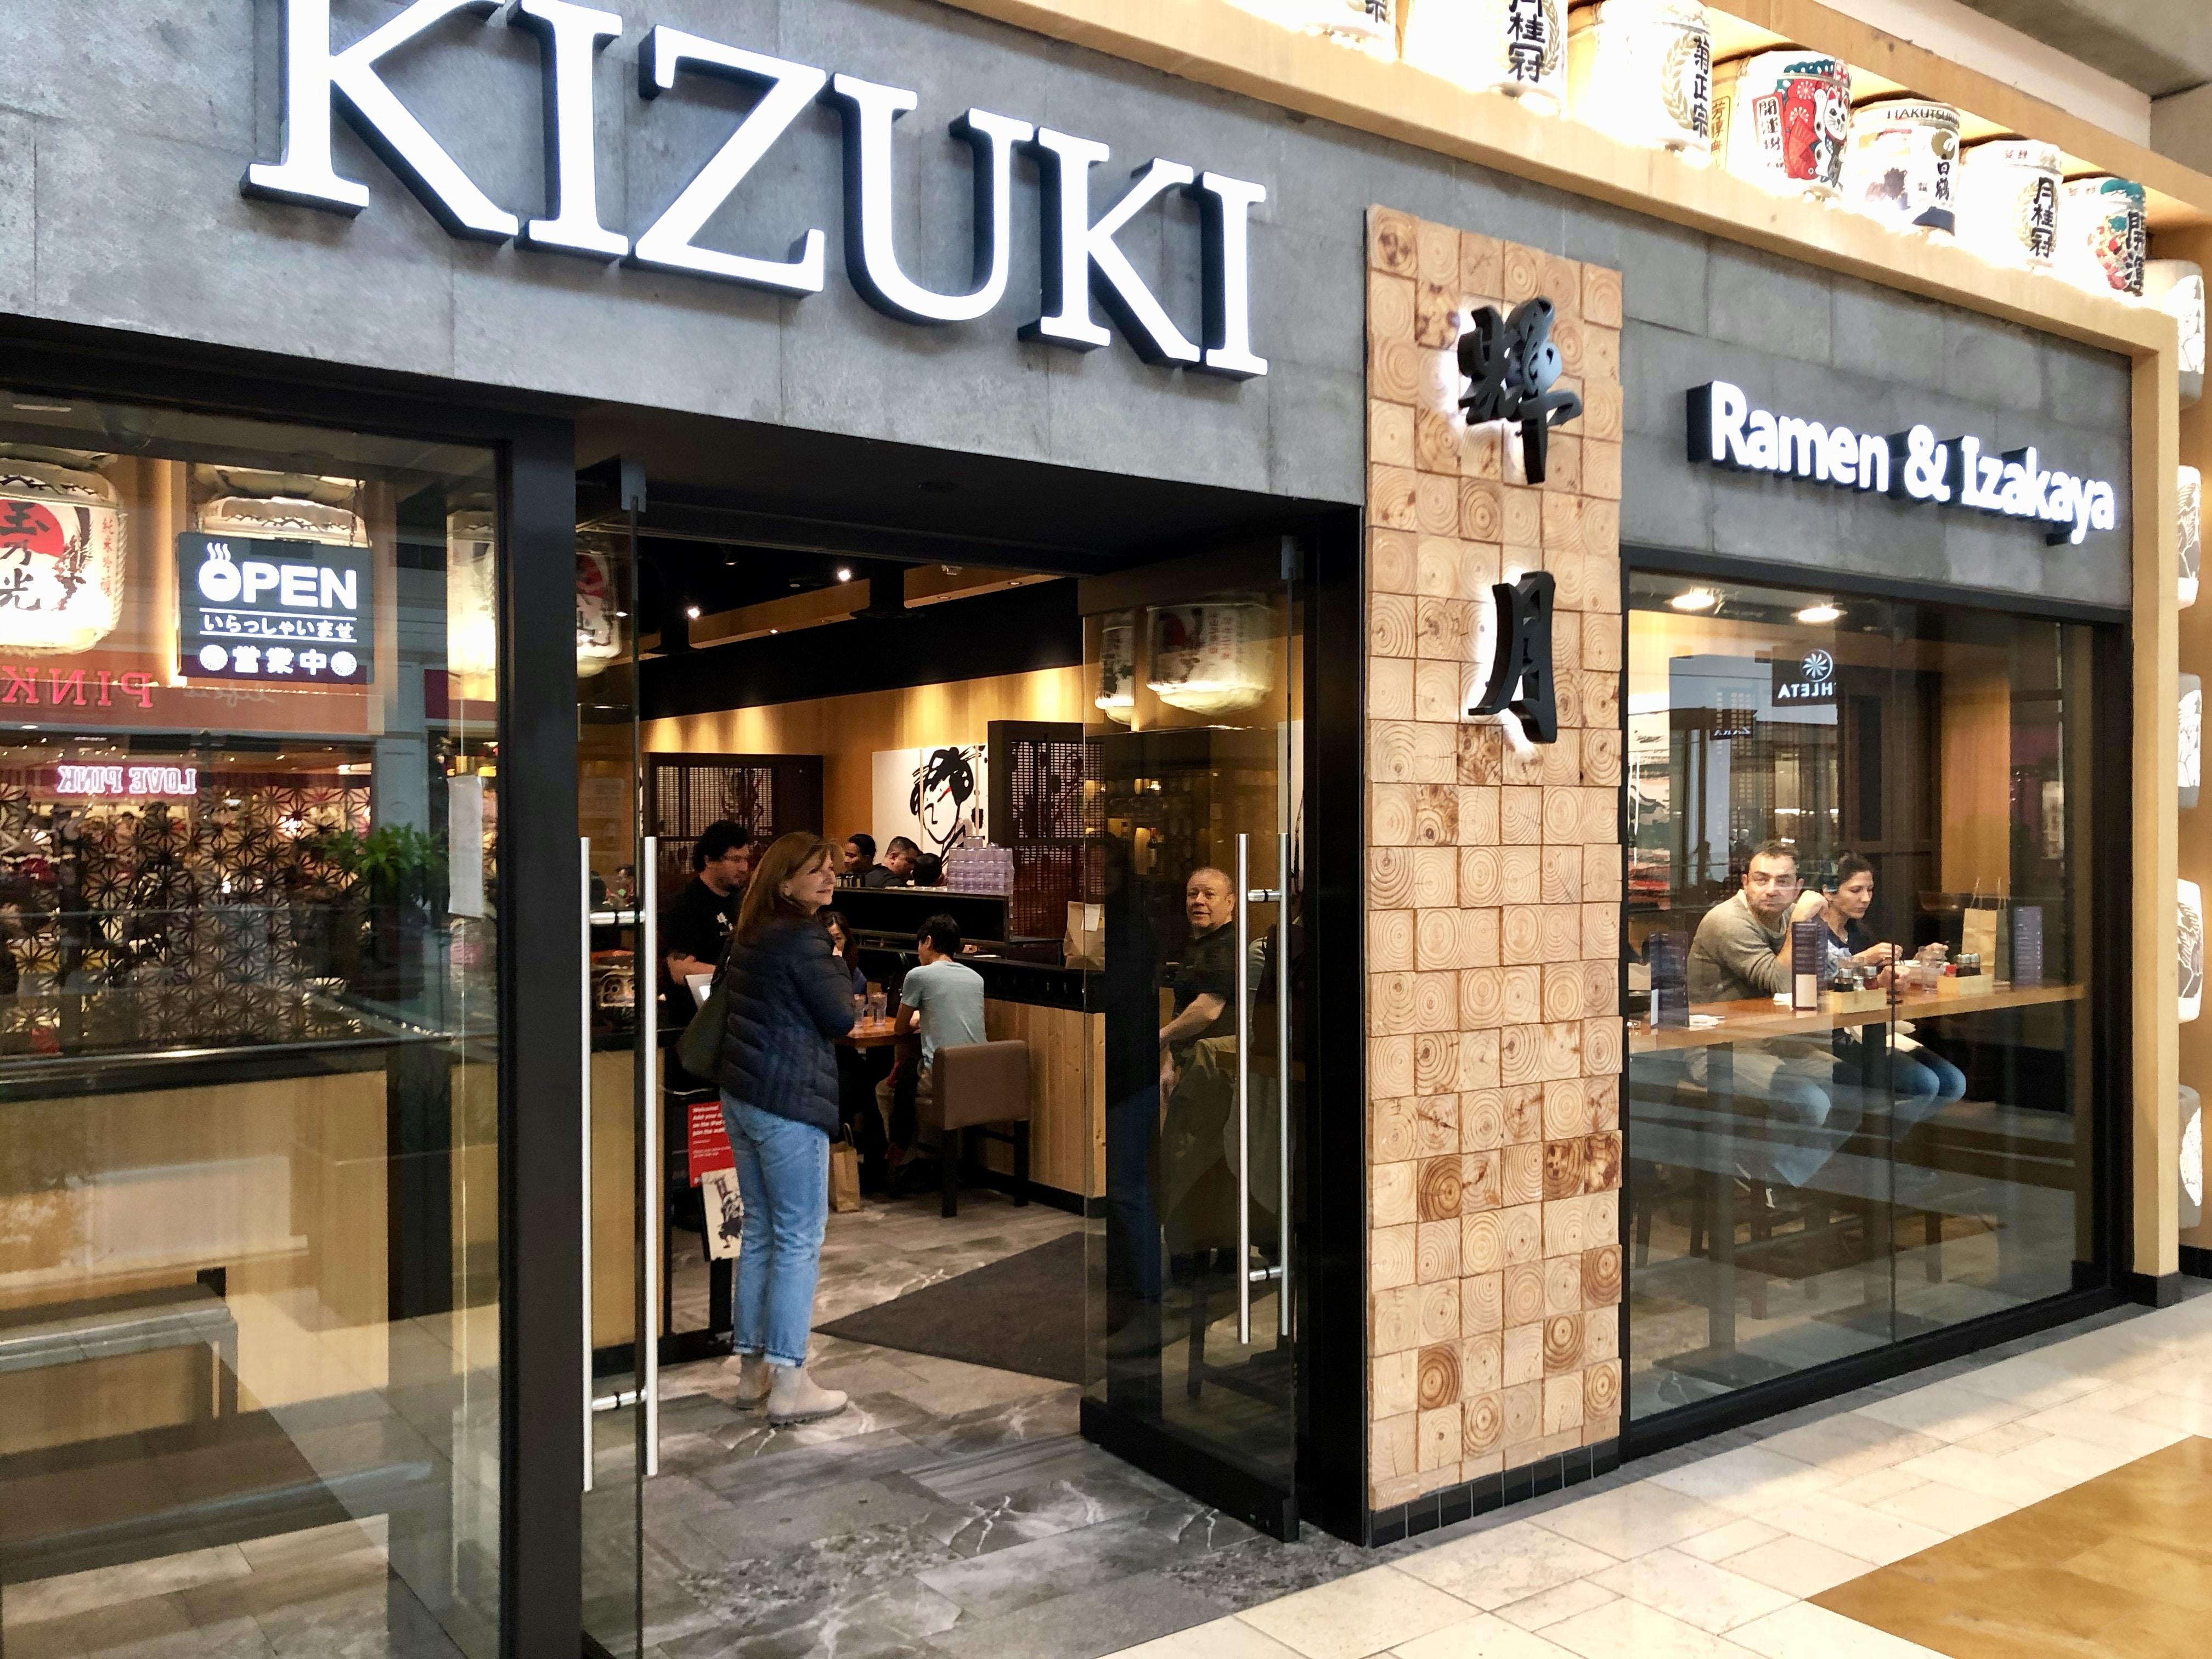 Kizuki Seattle